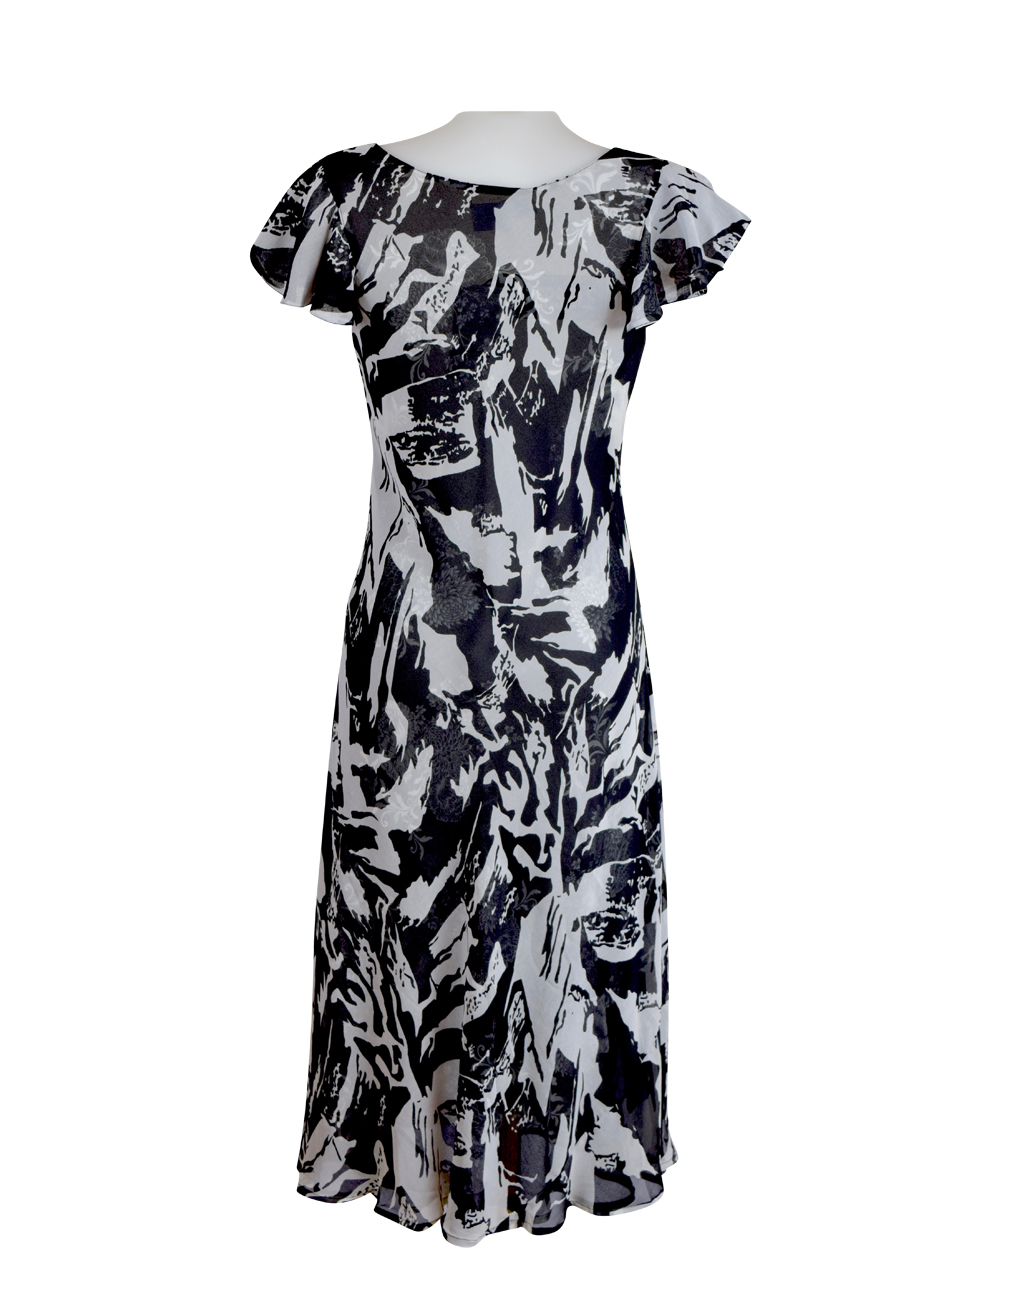 Paramour Reversible Dress Cap Sleeve Black & White4